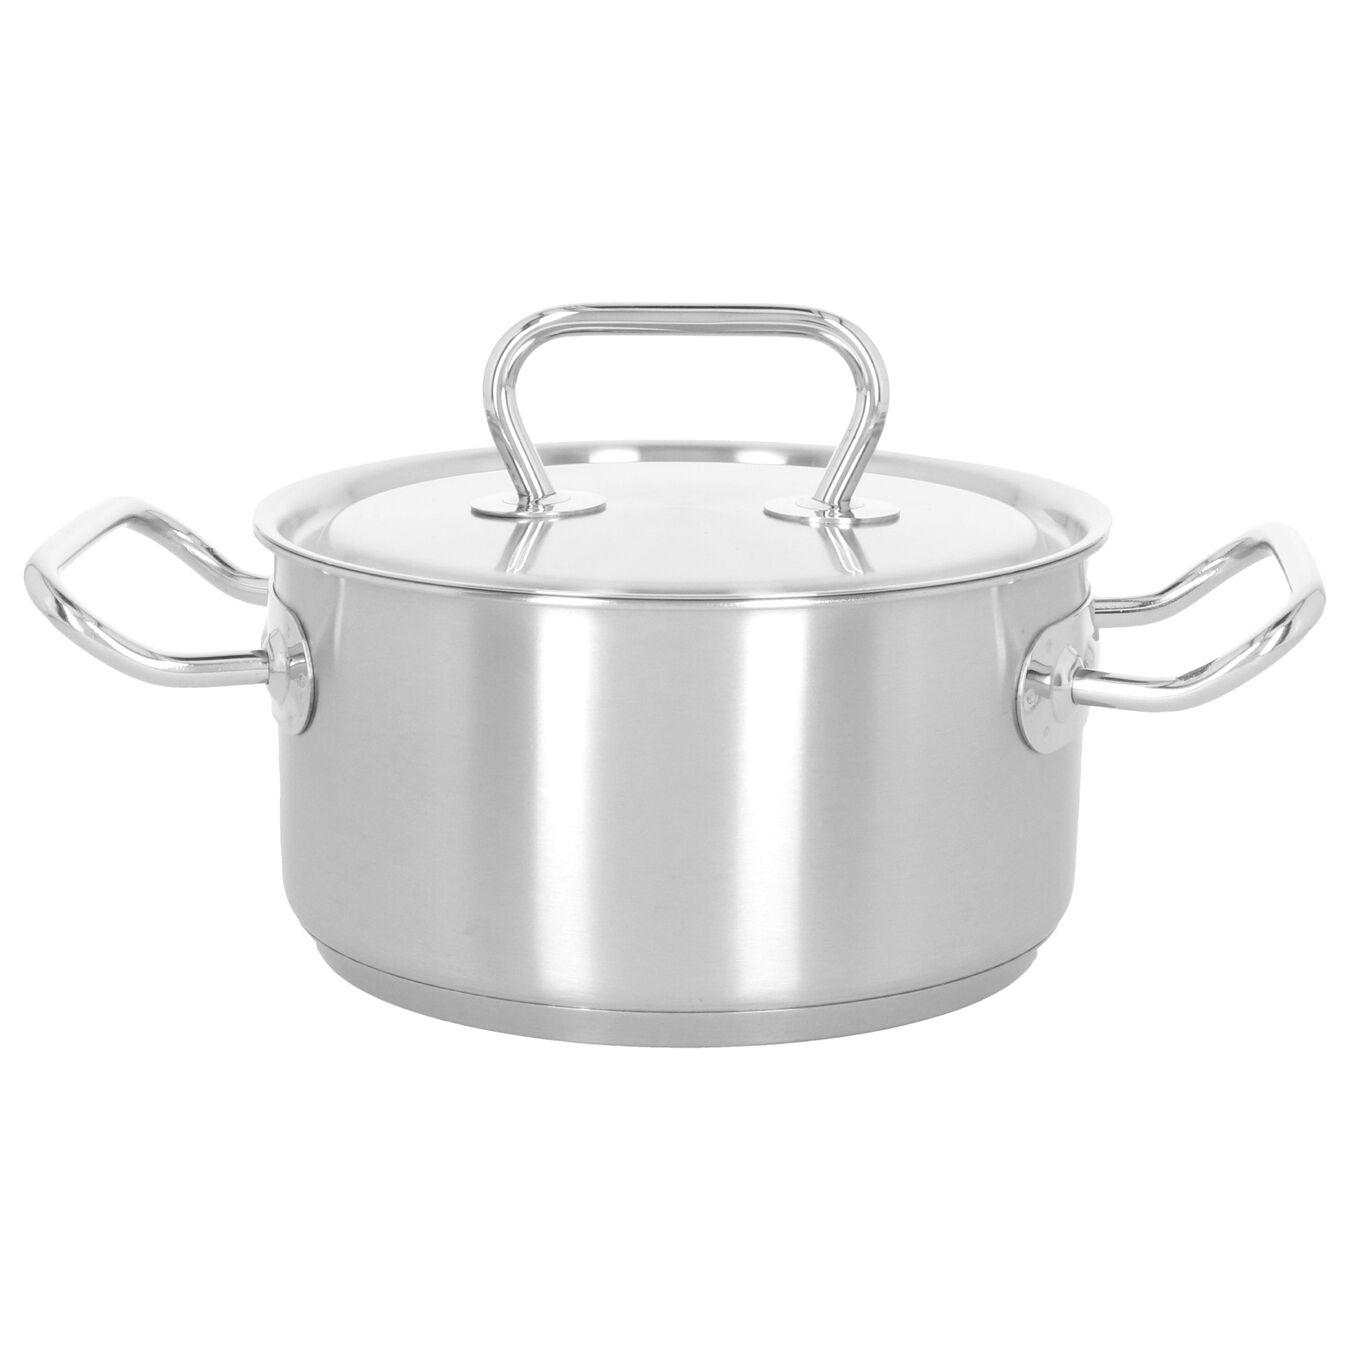 Kookpot met deksel 18 cm / 2 l,,large 1